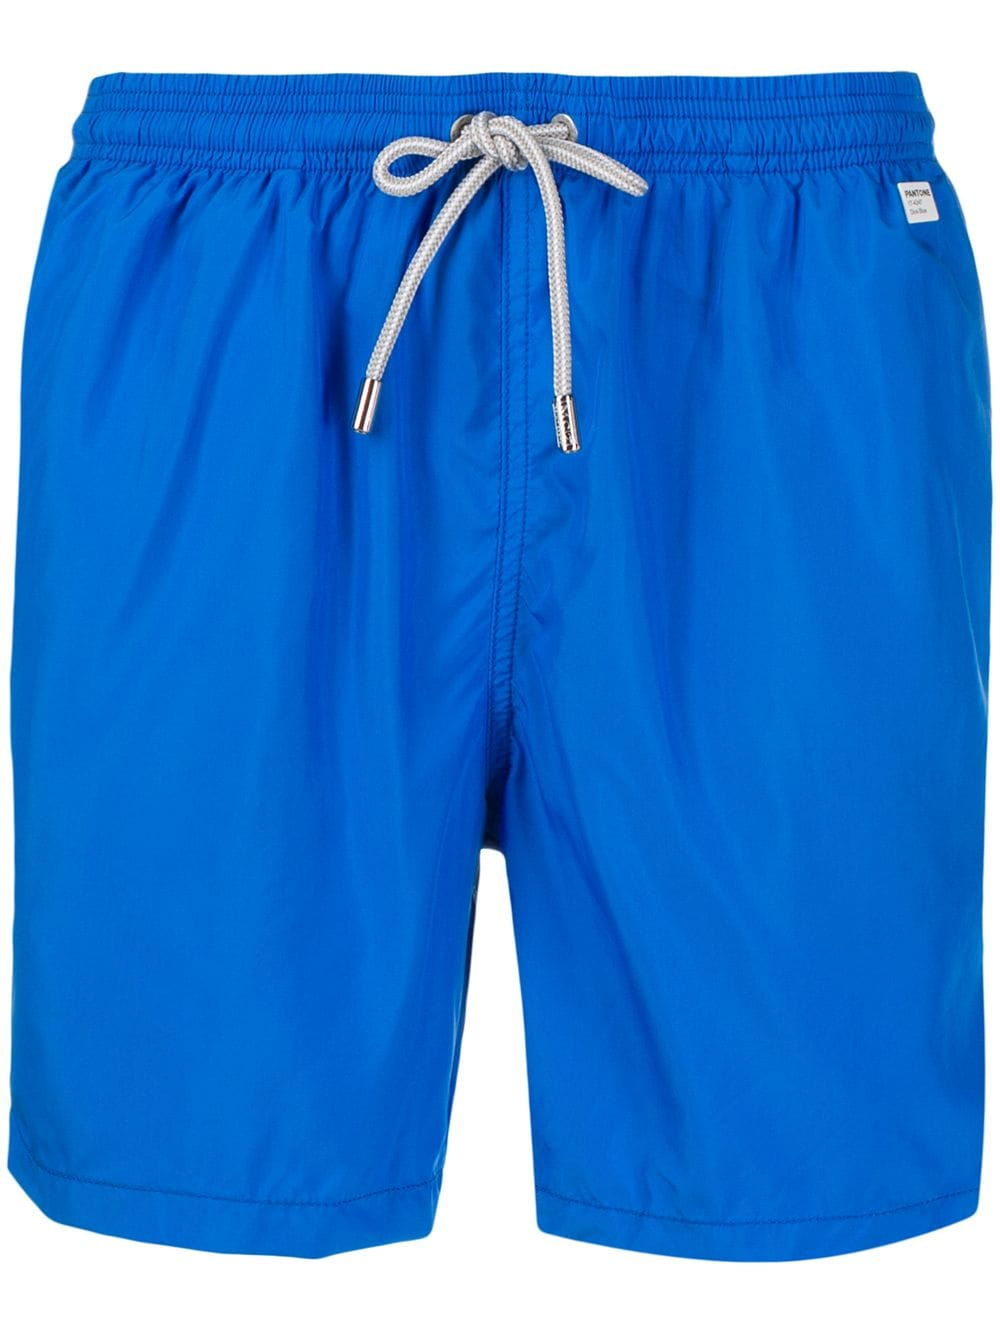 Shorts da bagno blu Pantone con coulisse in vita bianco MC2 | Costumi | LIGHTING PANTONE17